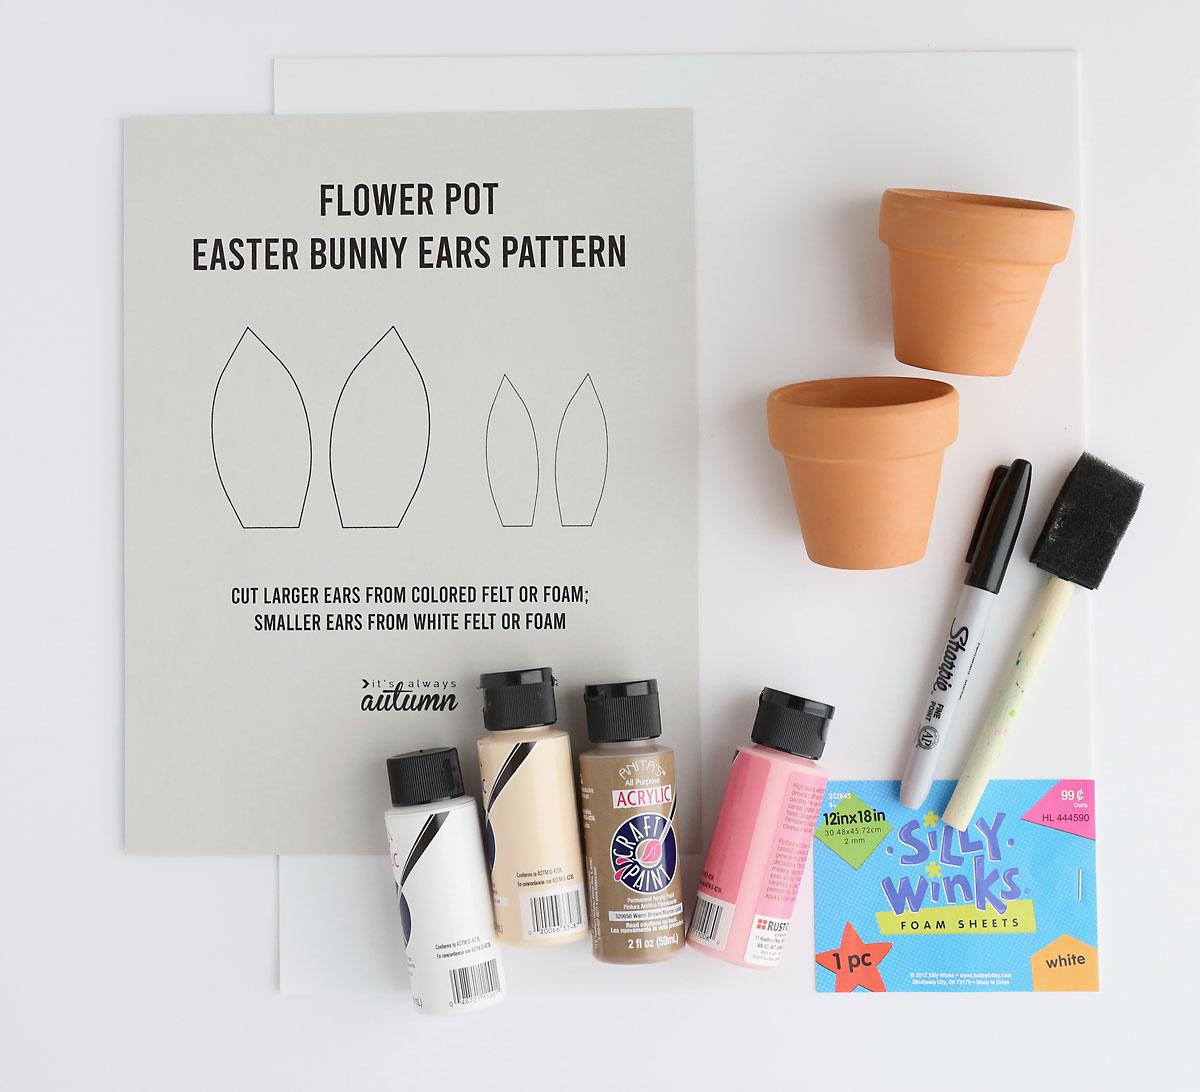 Flower pot bunny supplies: ears template, acrylic paints, flower pots, Sharpie, foam brush, craft foam sheet